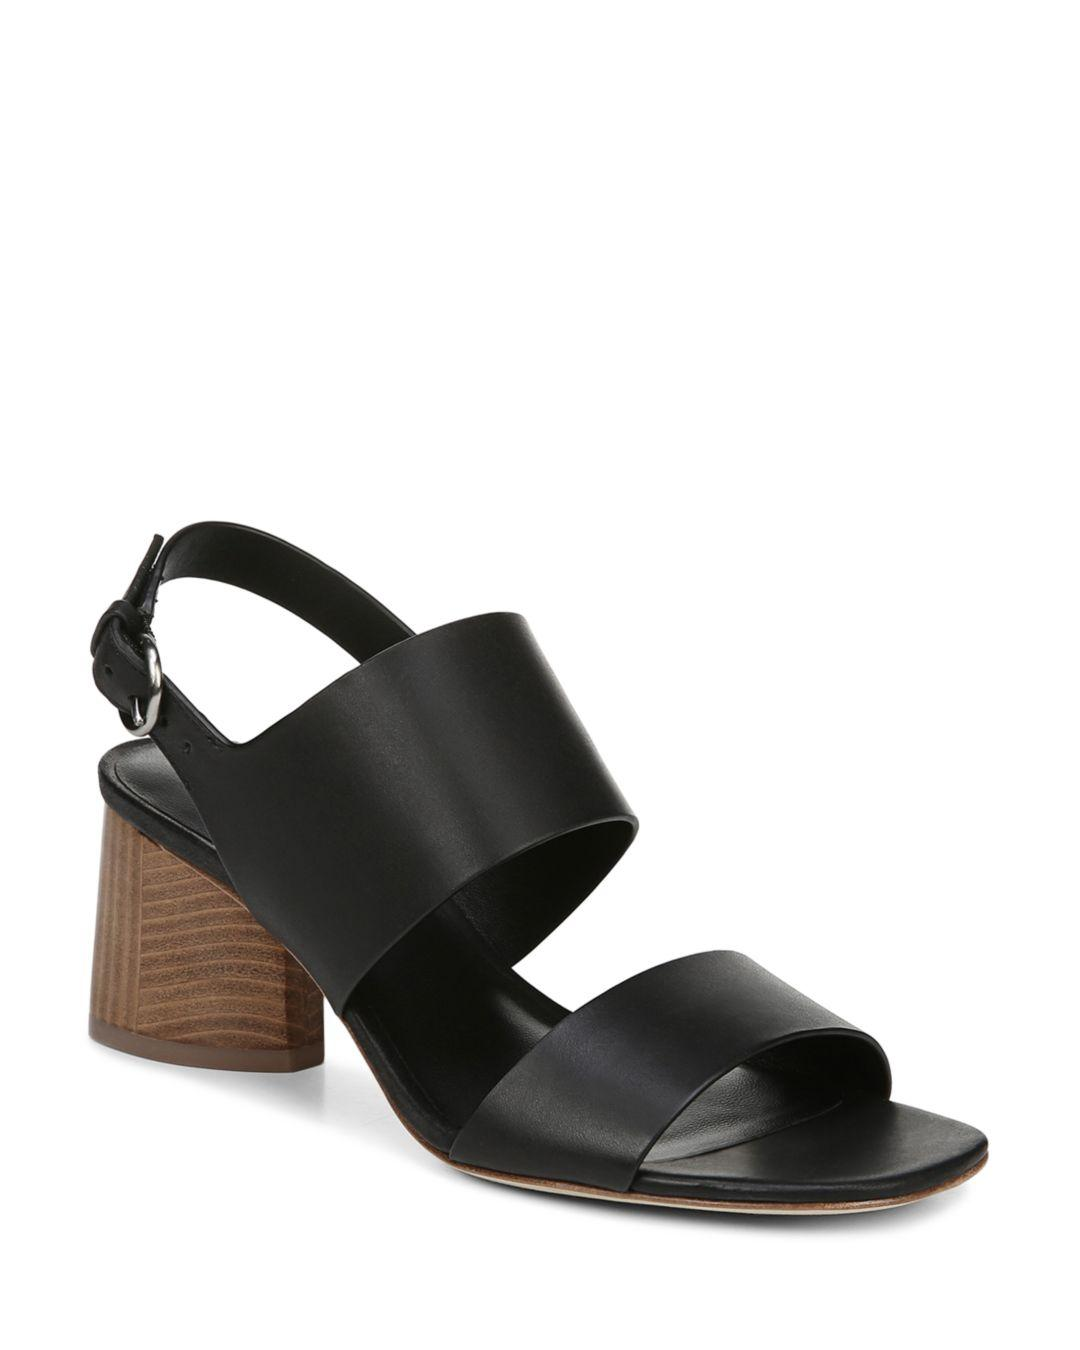 8bc618e5dd29 Via Spiga Women s Libby Block Heel Sandals in Black - Lyst